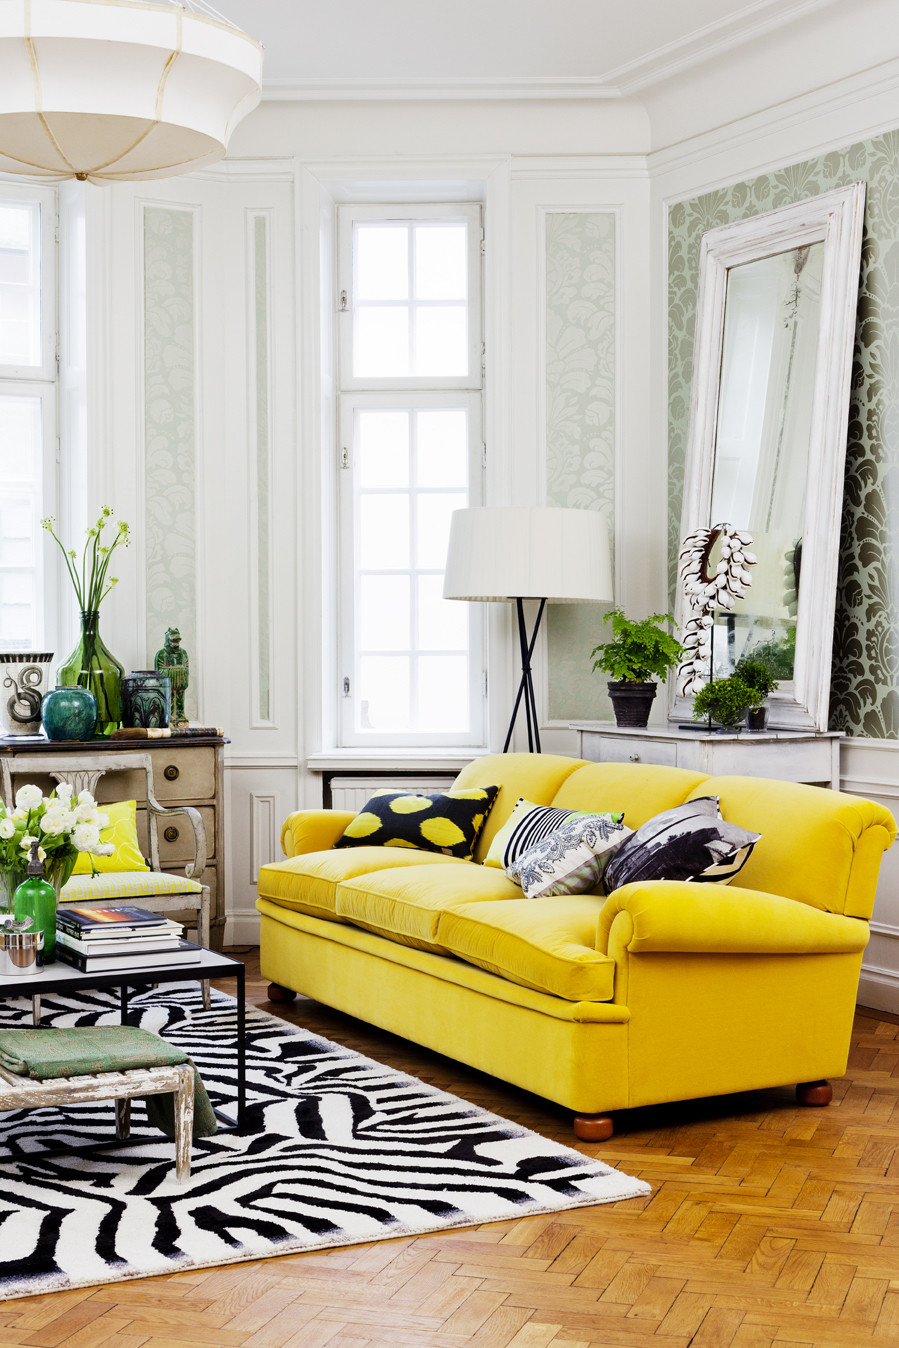 Design Around Statement Sofa